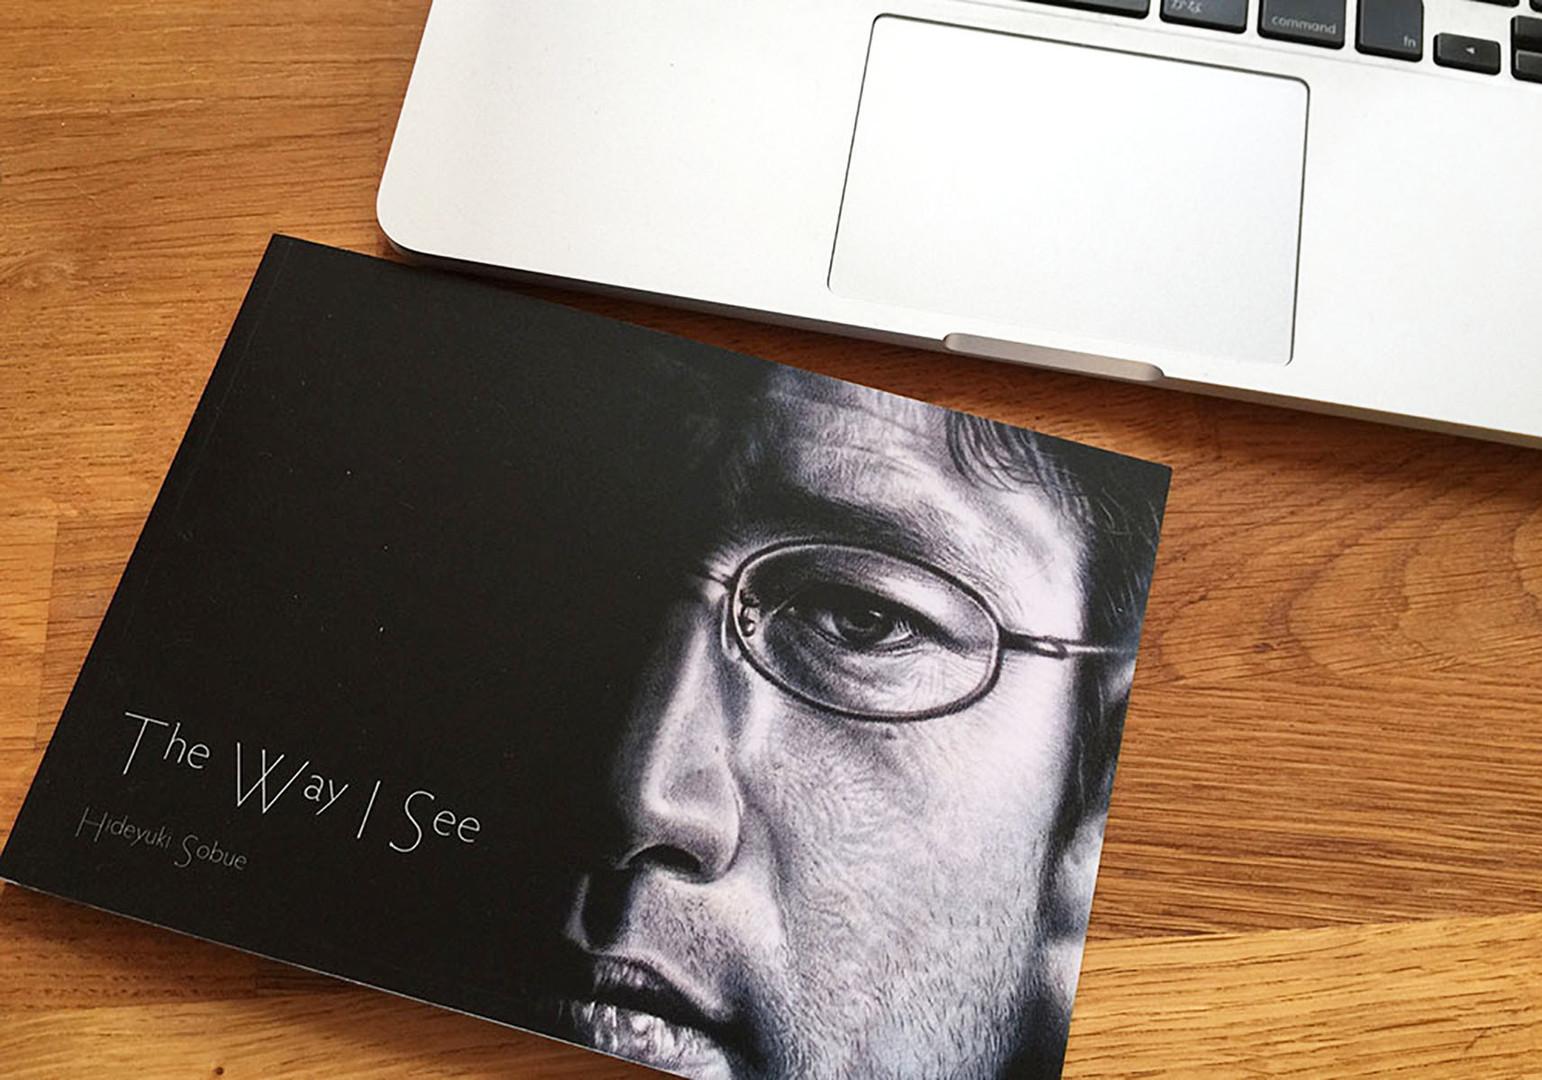 The Way I See - exhibition catalogue